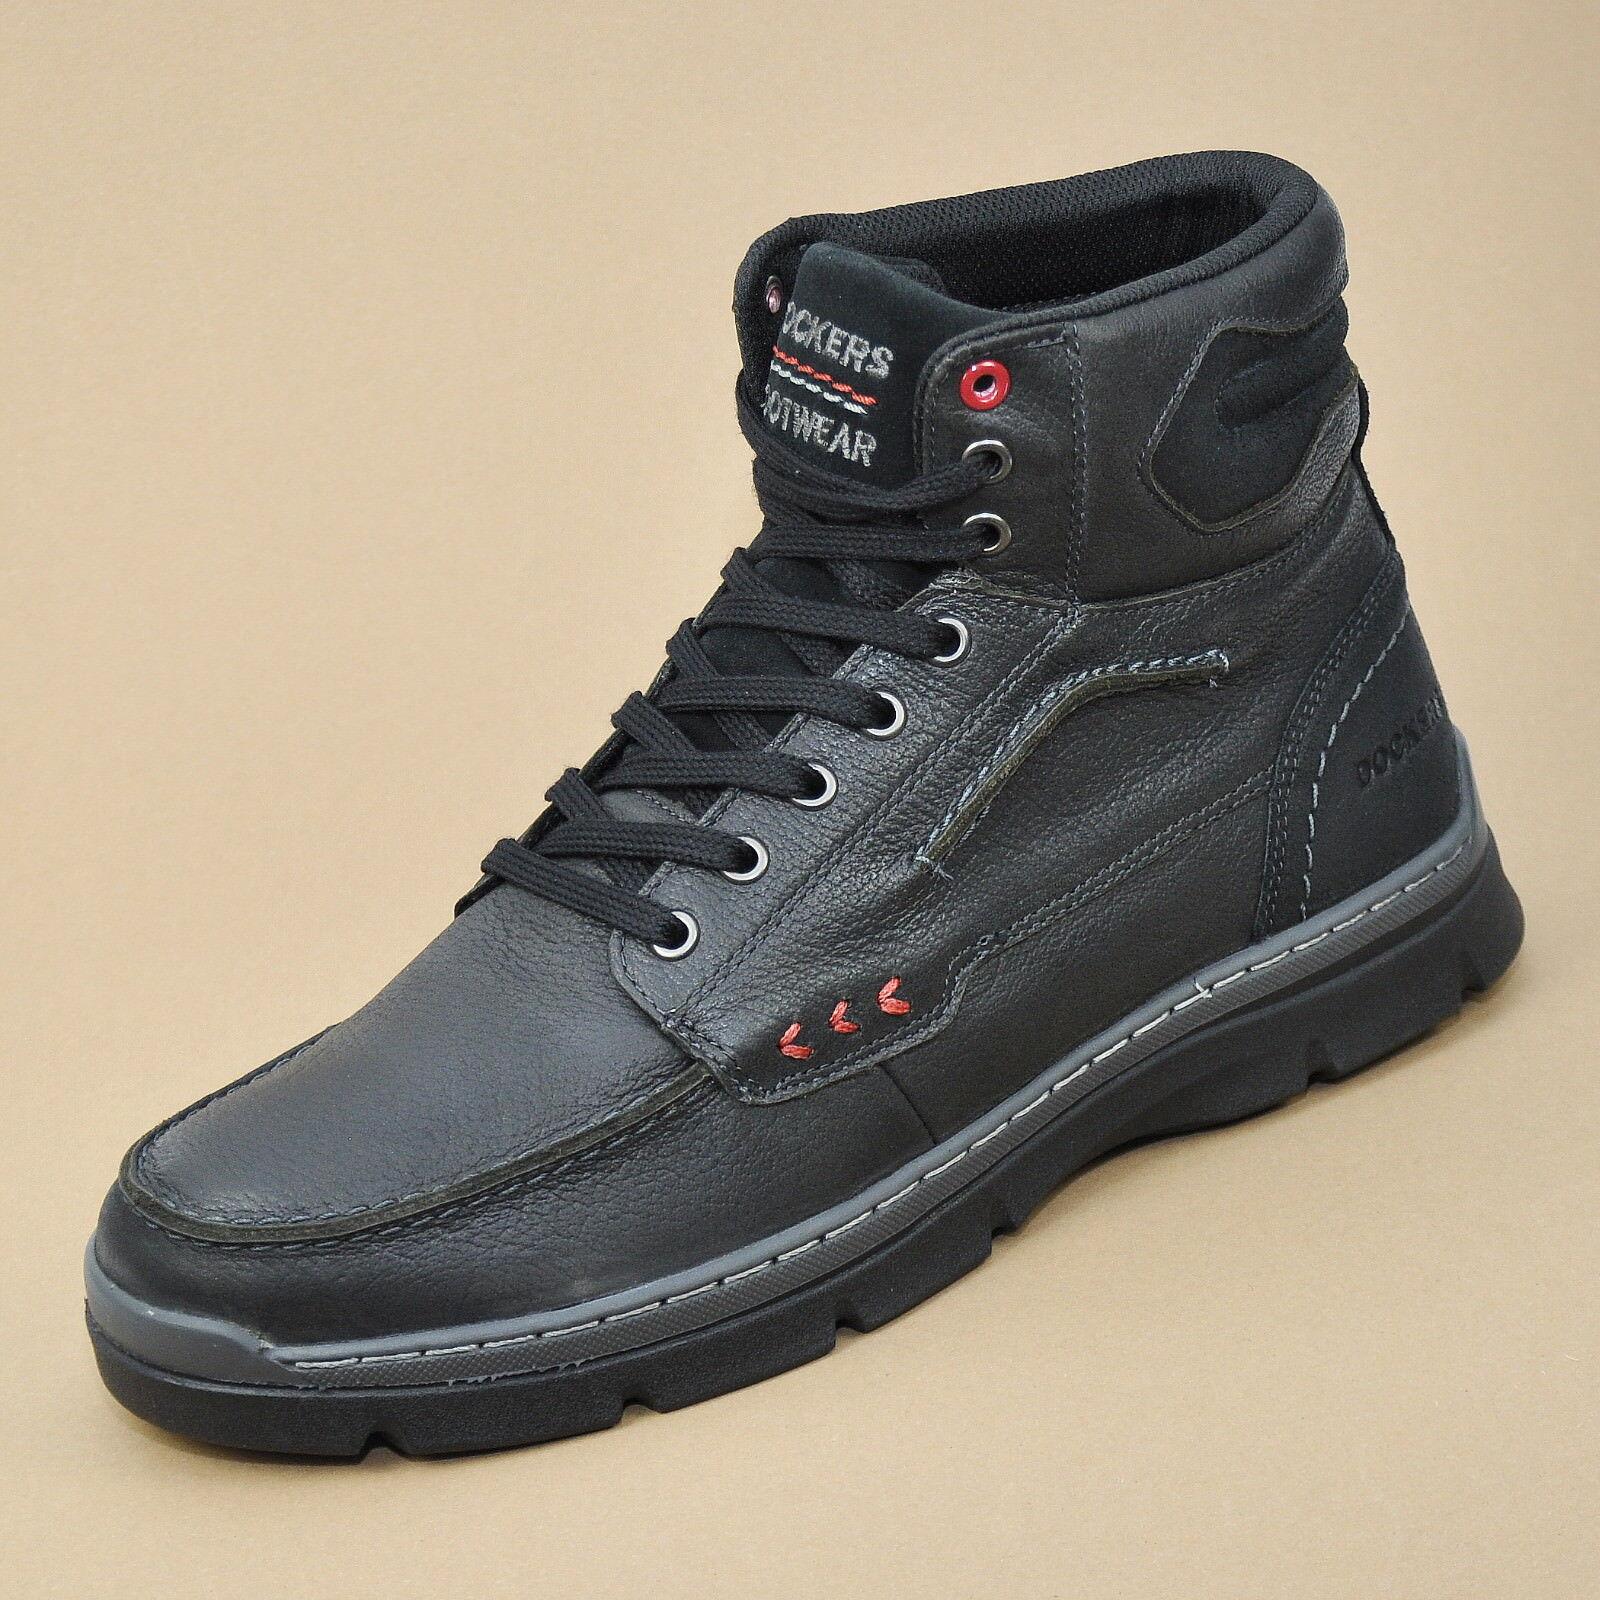 DOCKERS Herren Stiefel Leder Schuhe Stiefel Schwarz 352610-239001